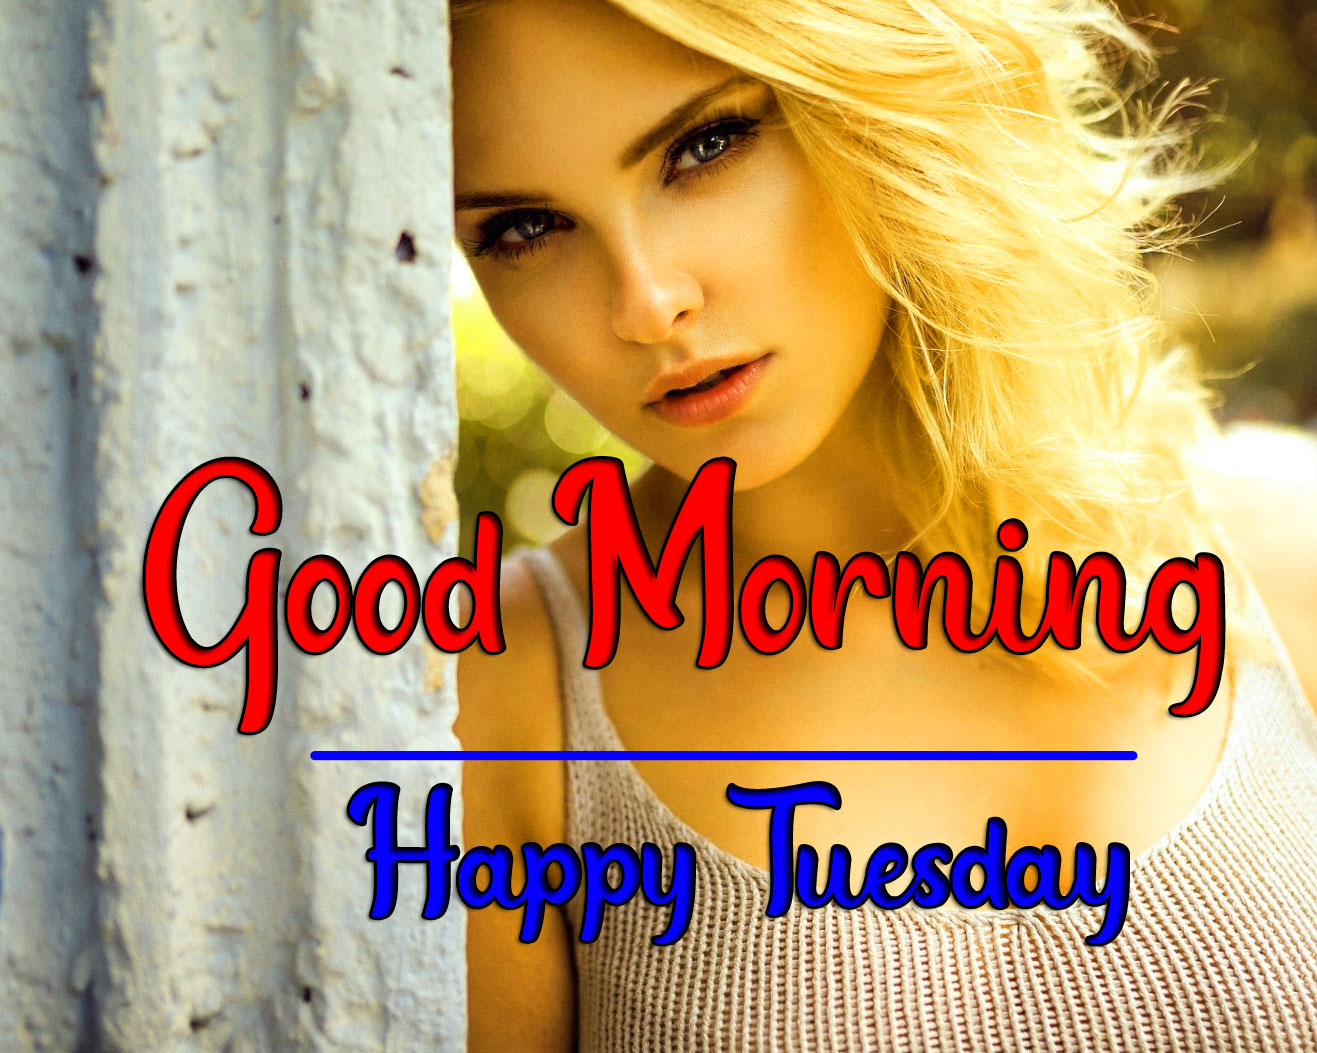 Girls Beautiful Tuesday Good morning Images